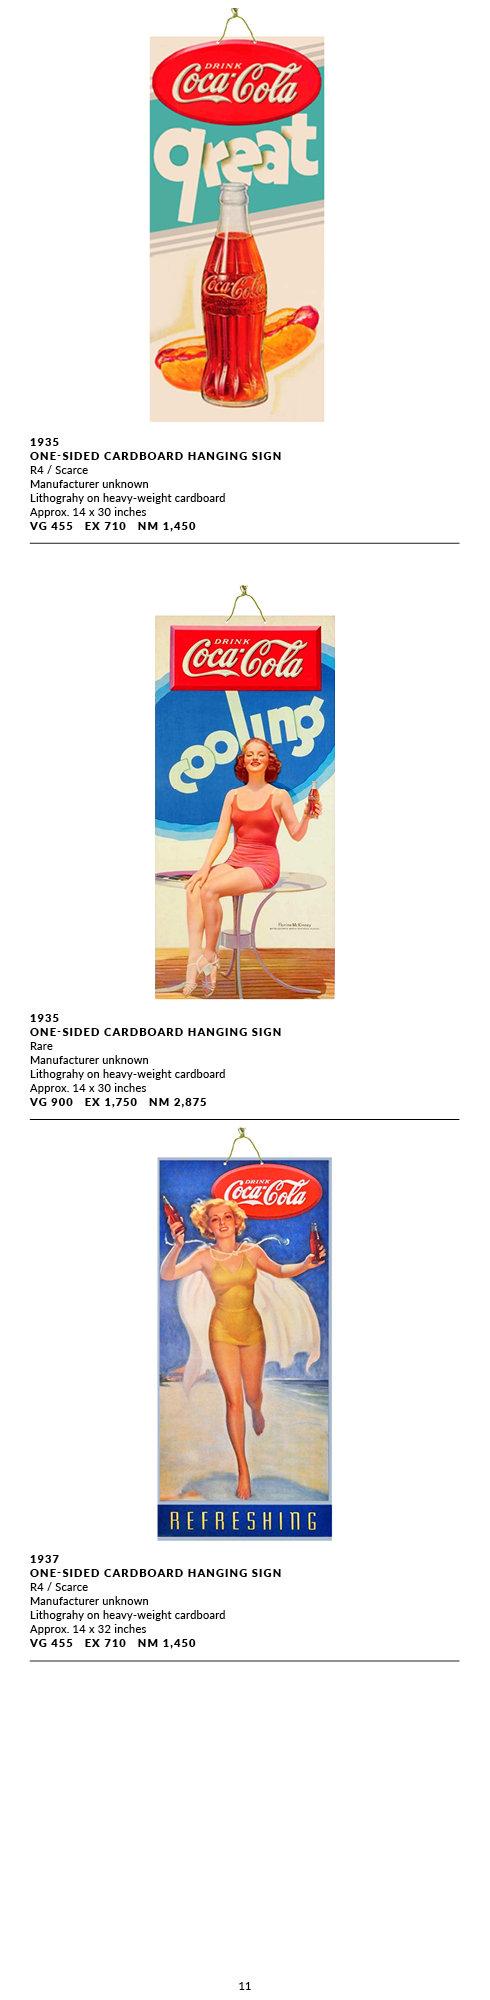 1904-1939RectCardboards (2021)11.jpg